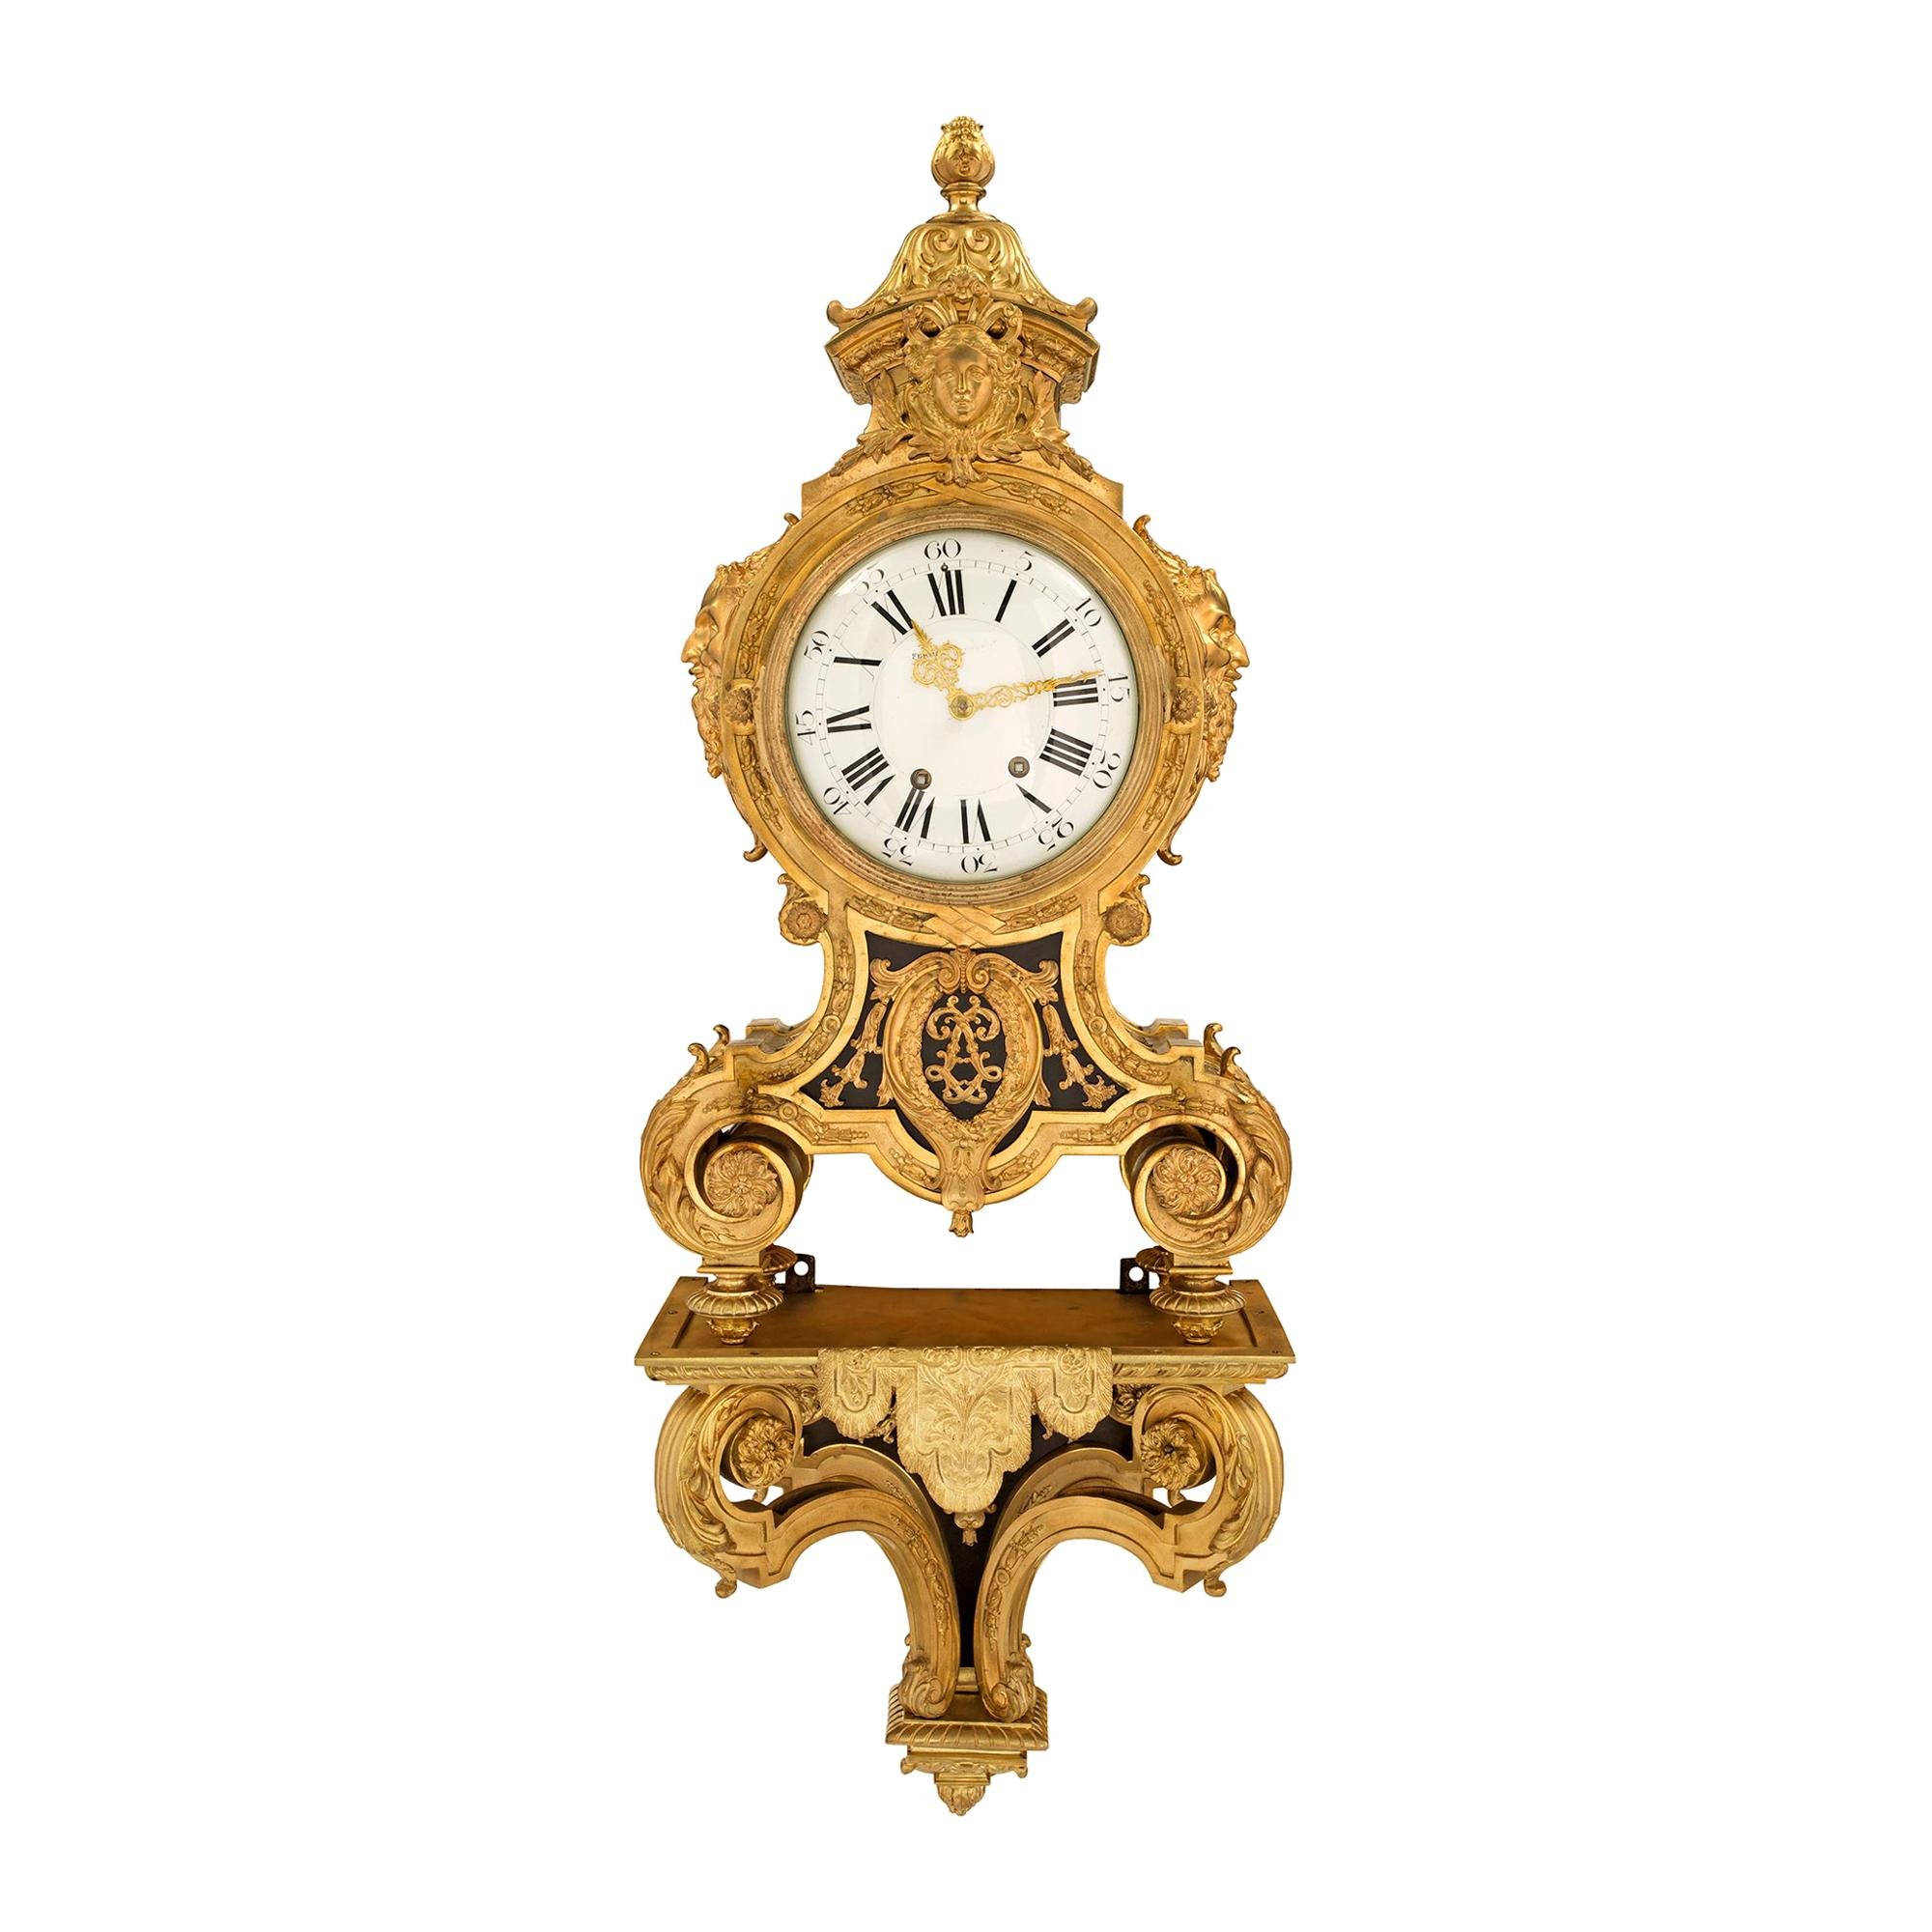 French 19th Century Louis XIV Style Ormolu Cartel Clock